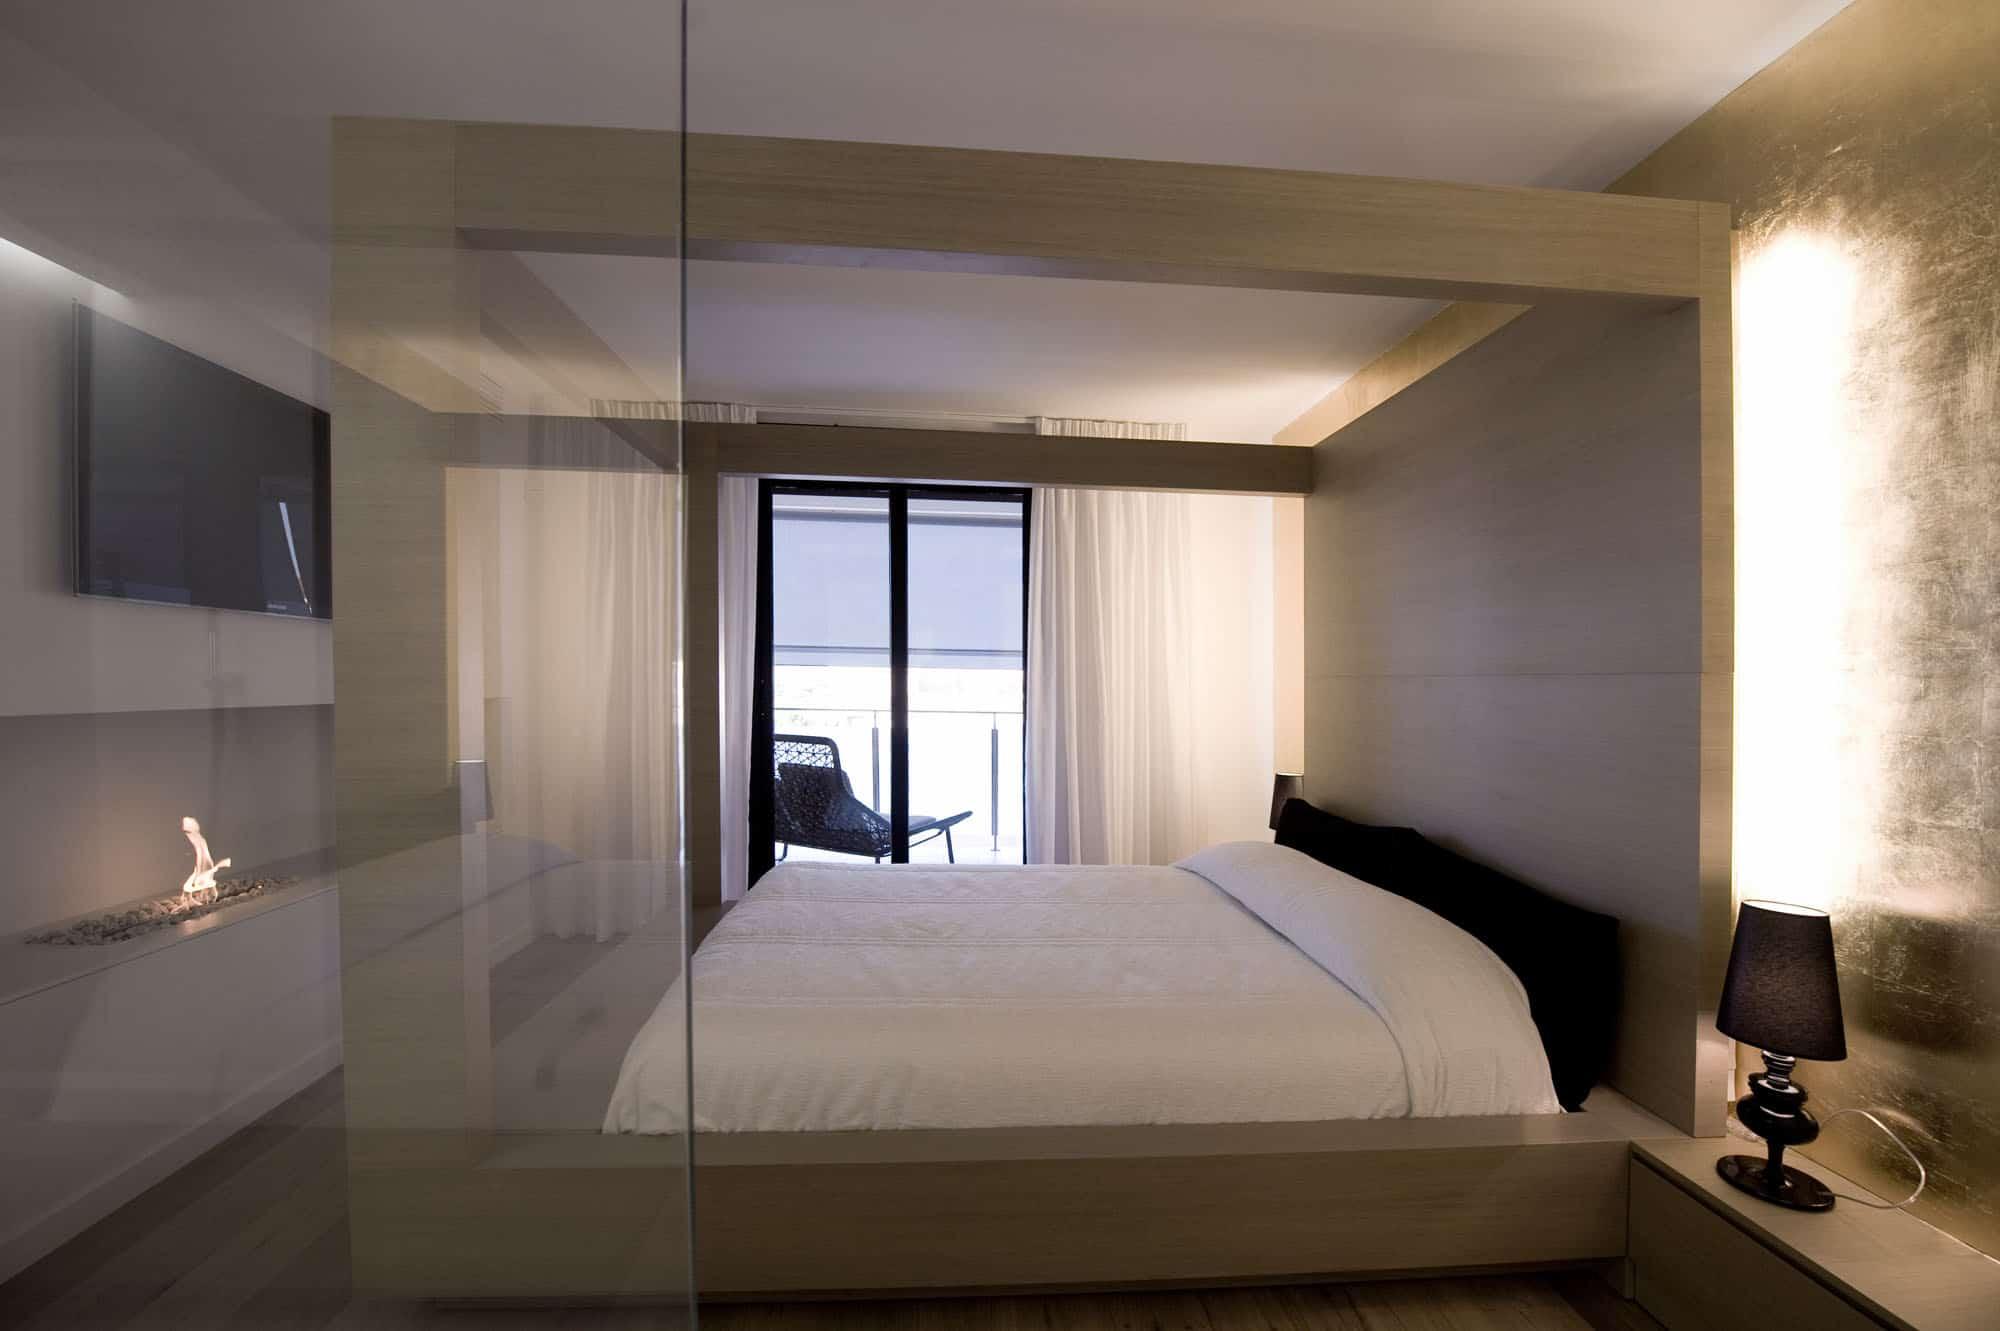 HI-MACS Doble Dueto Apartment by Cuartopensante (33)